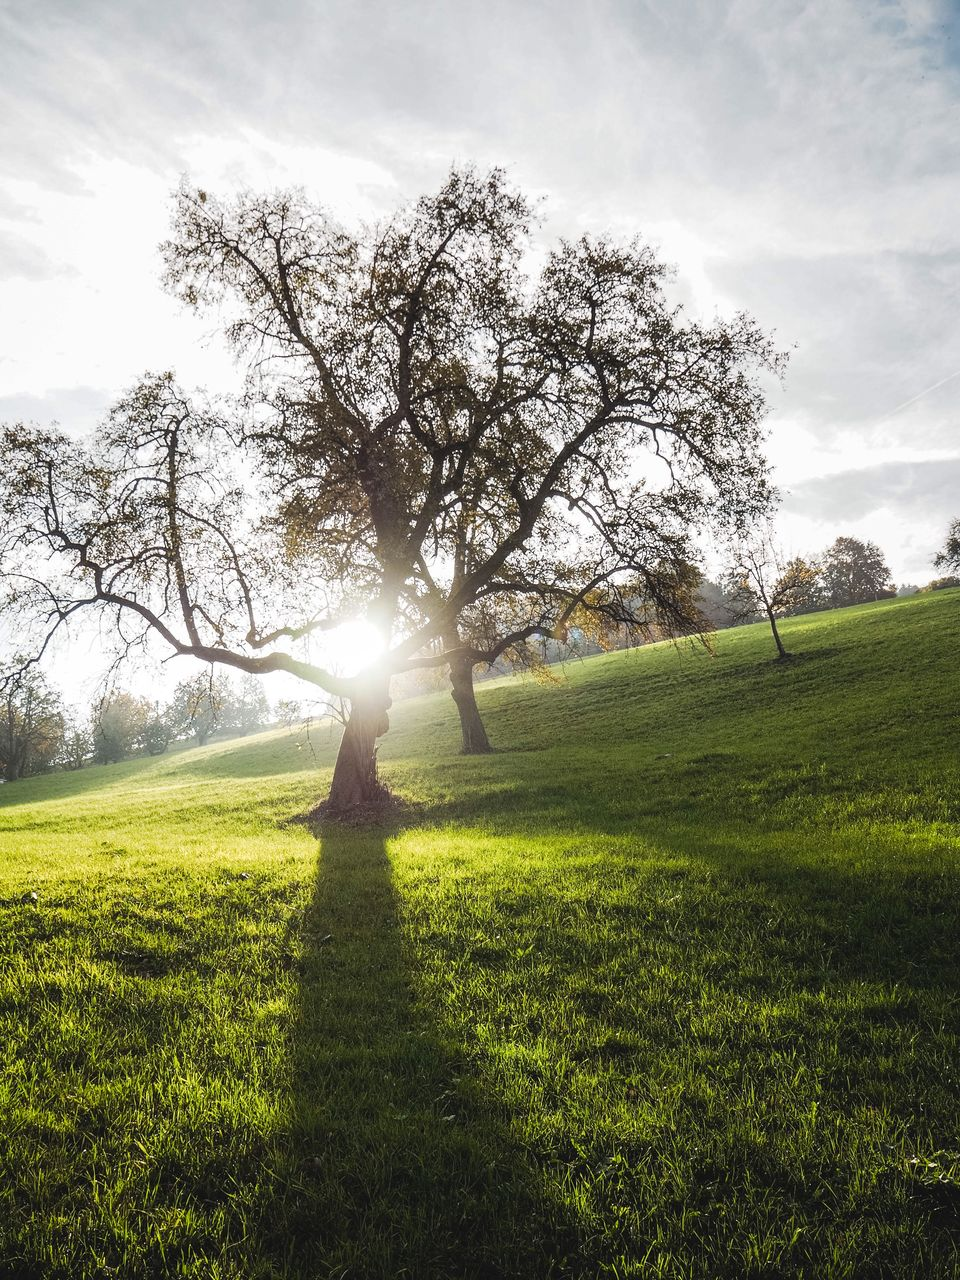 Trees on grassy field against sky